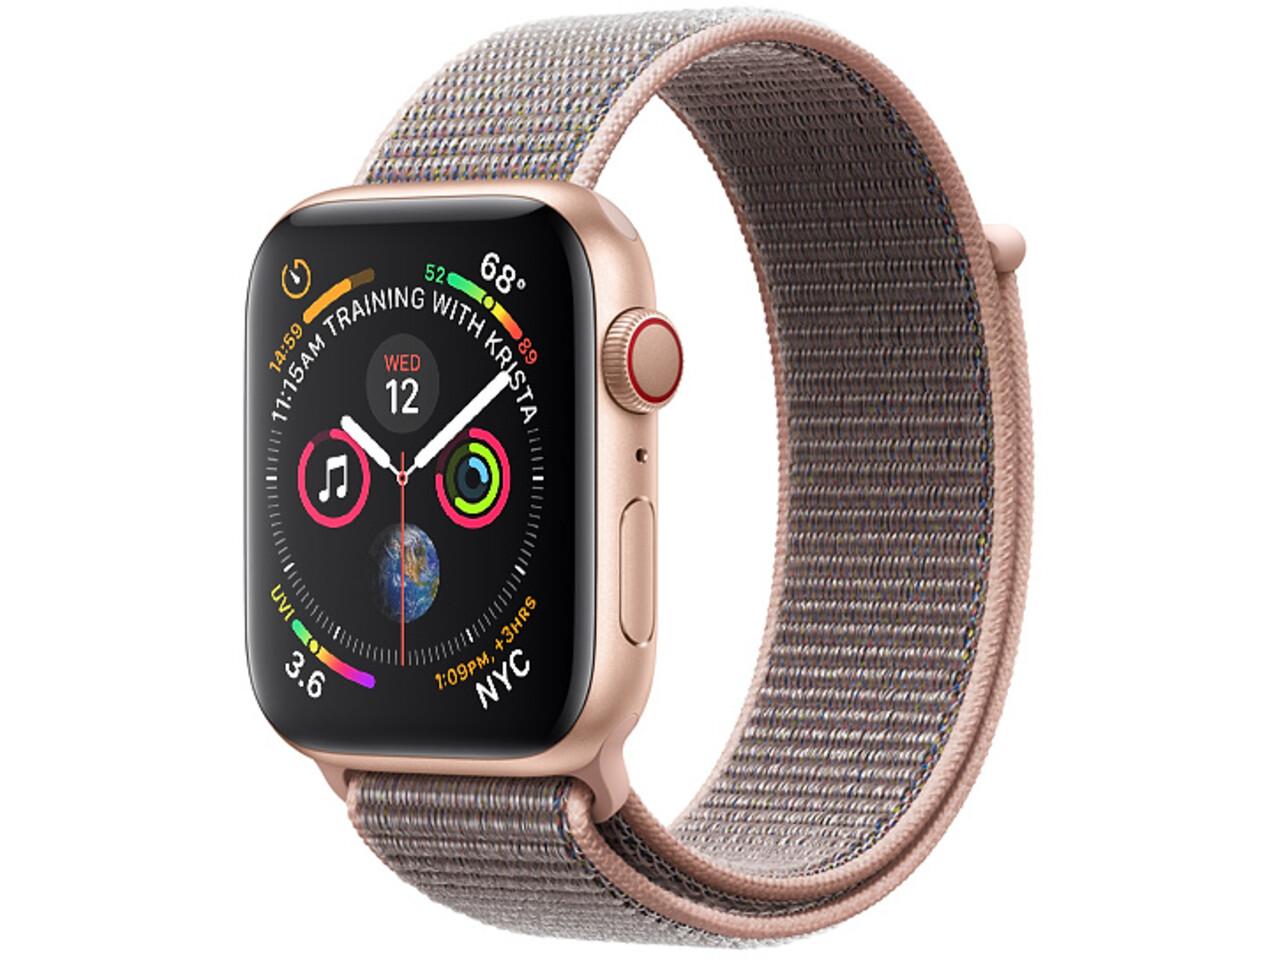 apple watch series 4 cellular 40mm gold aluminum pink sand sport loop